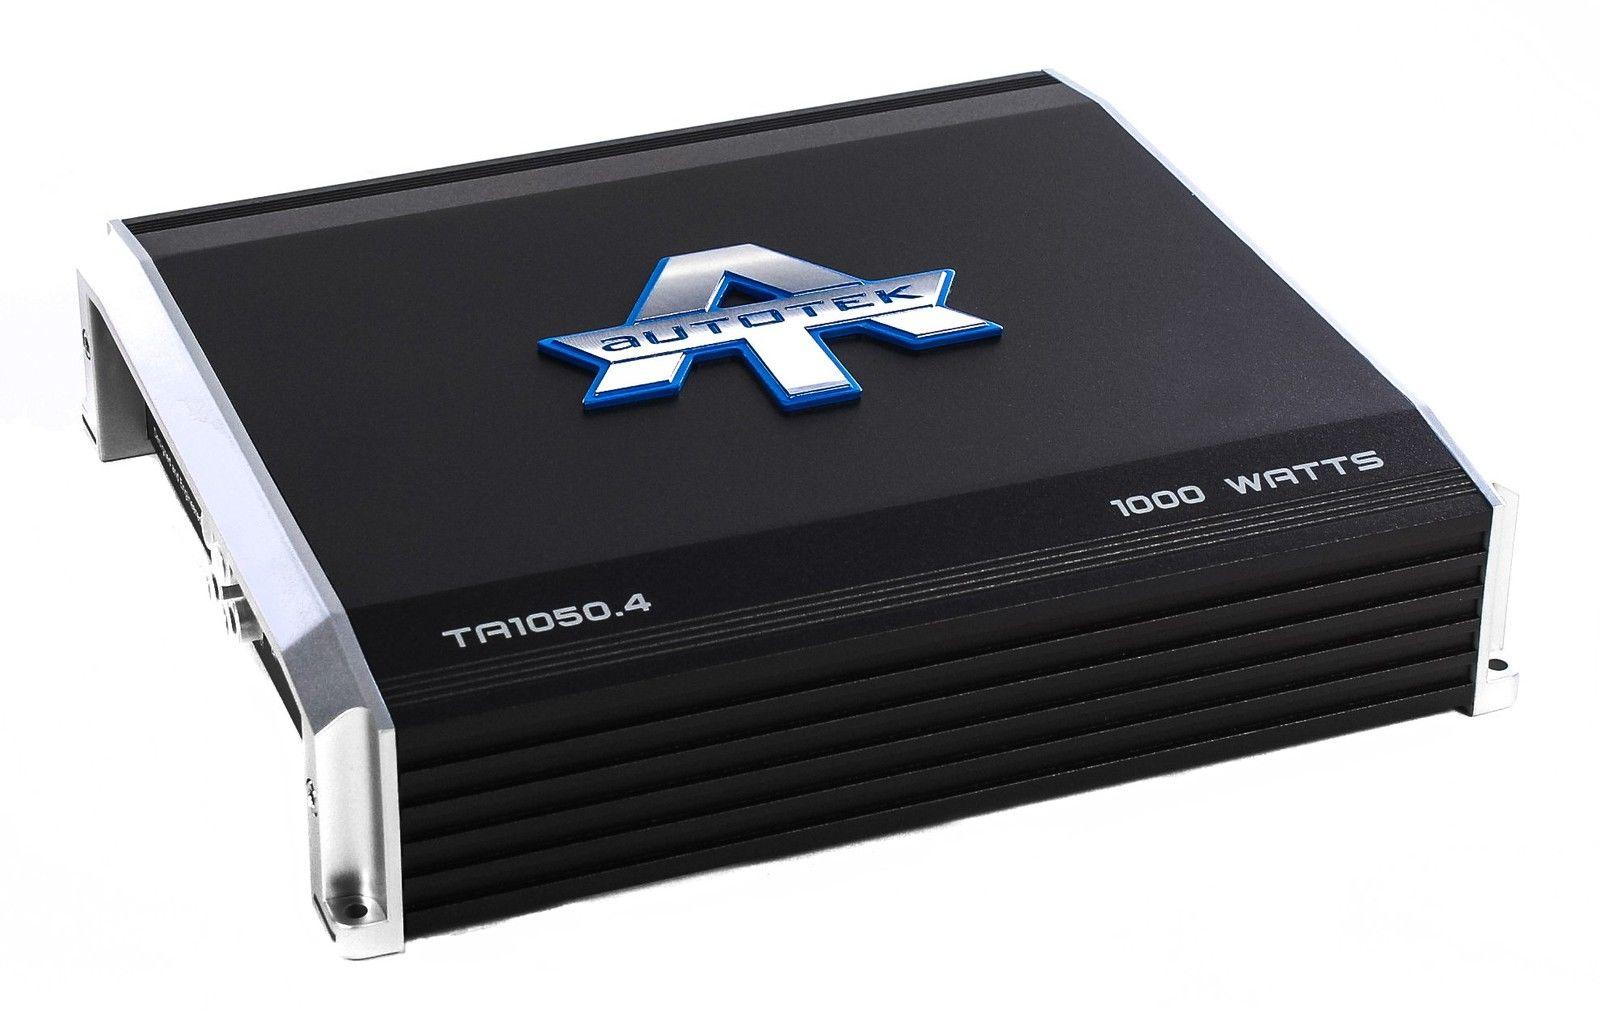 Autotek TA1050.4 amplifier image